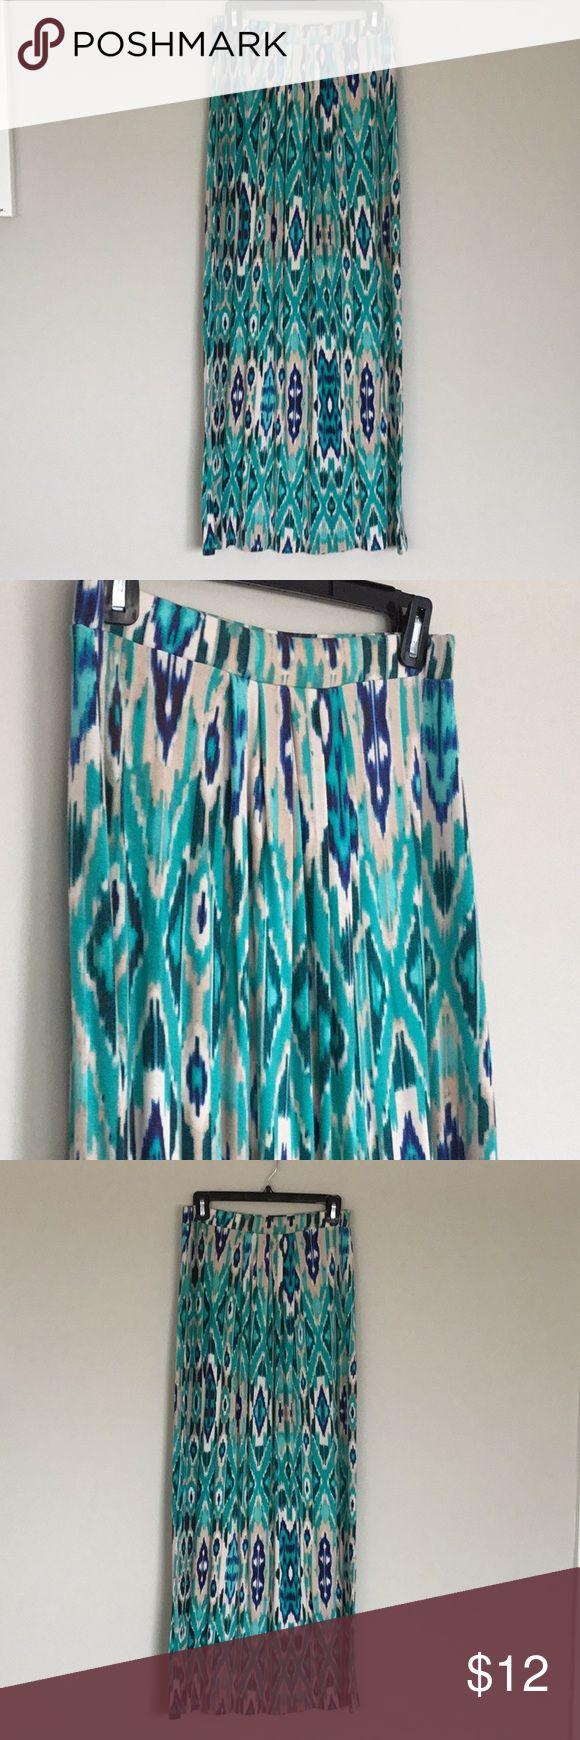 Never worn Cynthia Rowley tribal maxi skirt! Soft pleated maxi skirt Cynthia Rowley Skirts Maxi